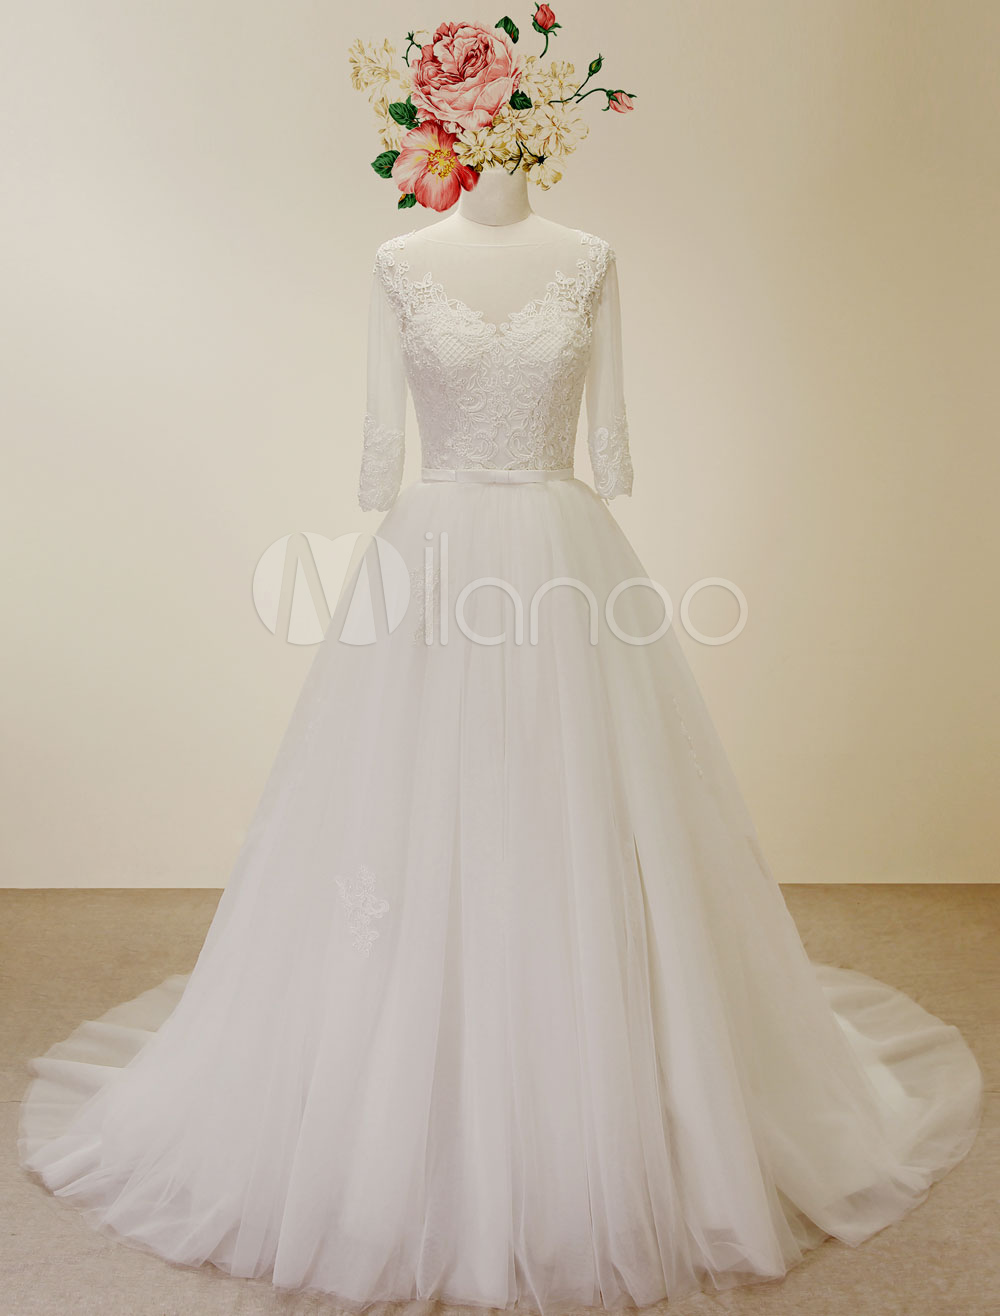 High Qulity A Line Wedding Dress Laced Applique Chaple Train Bridal Gown